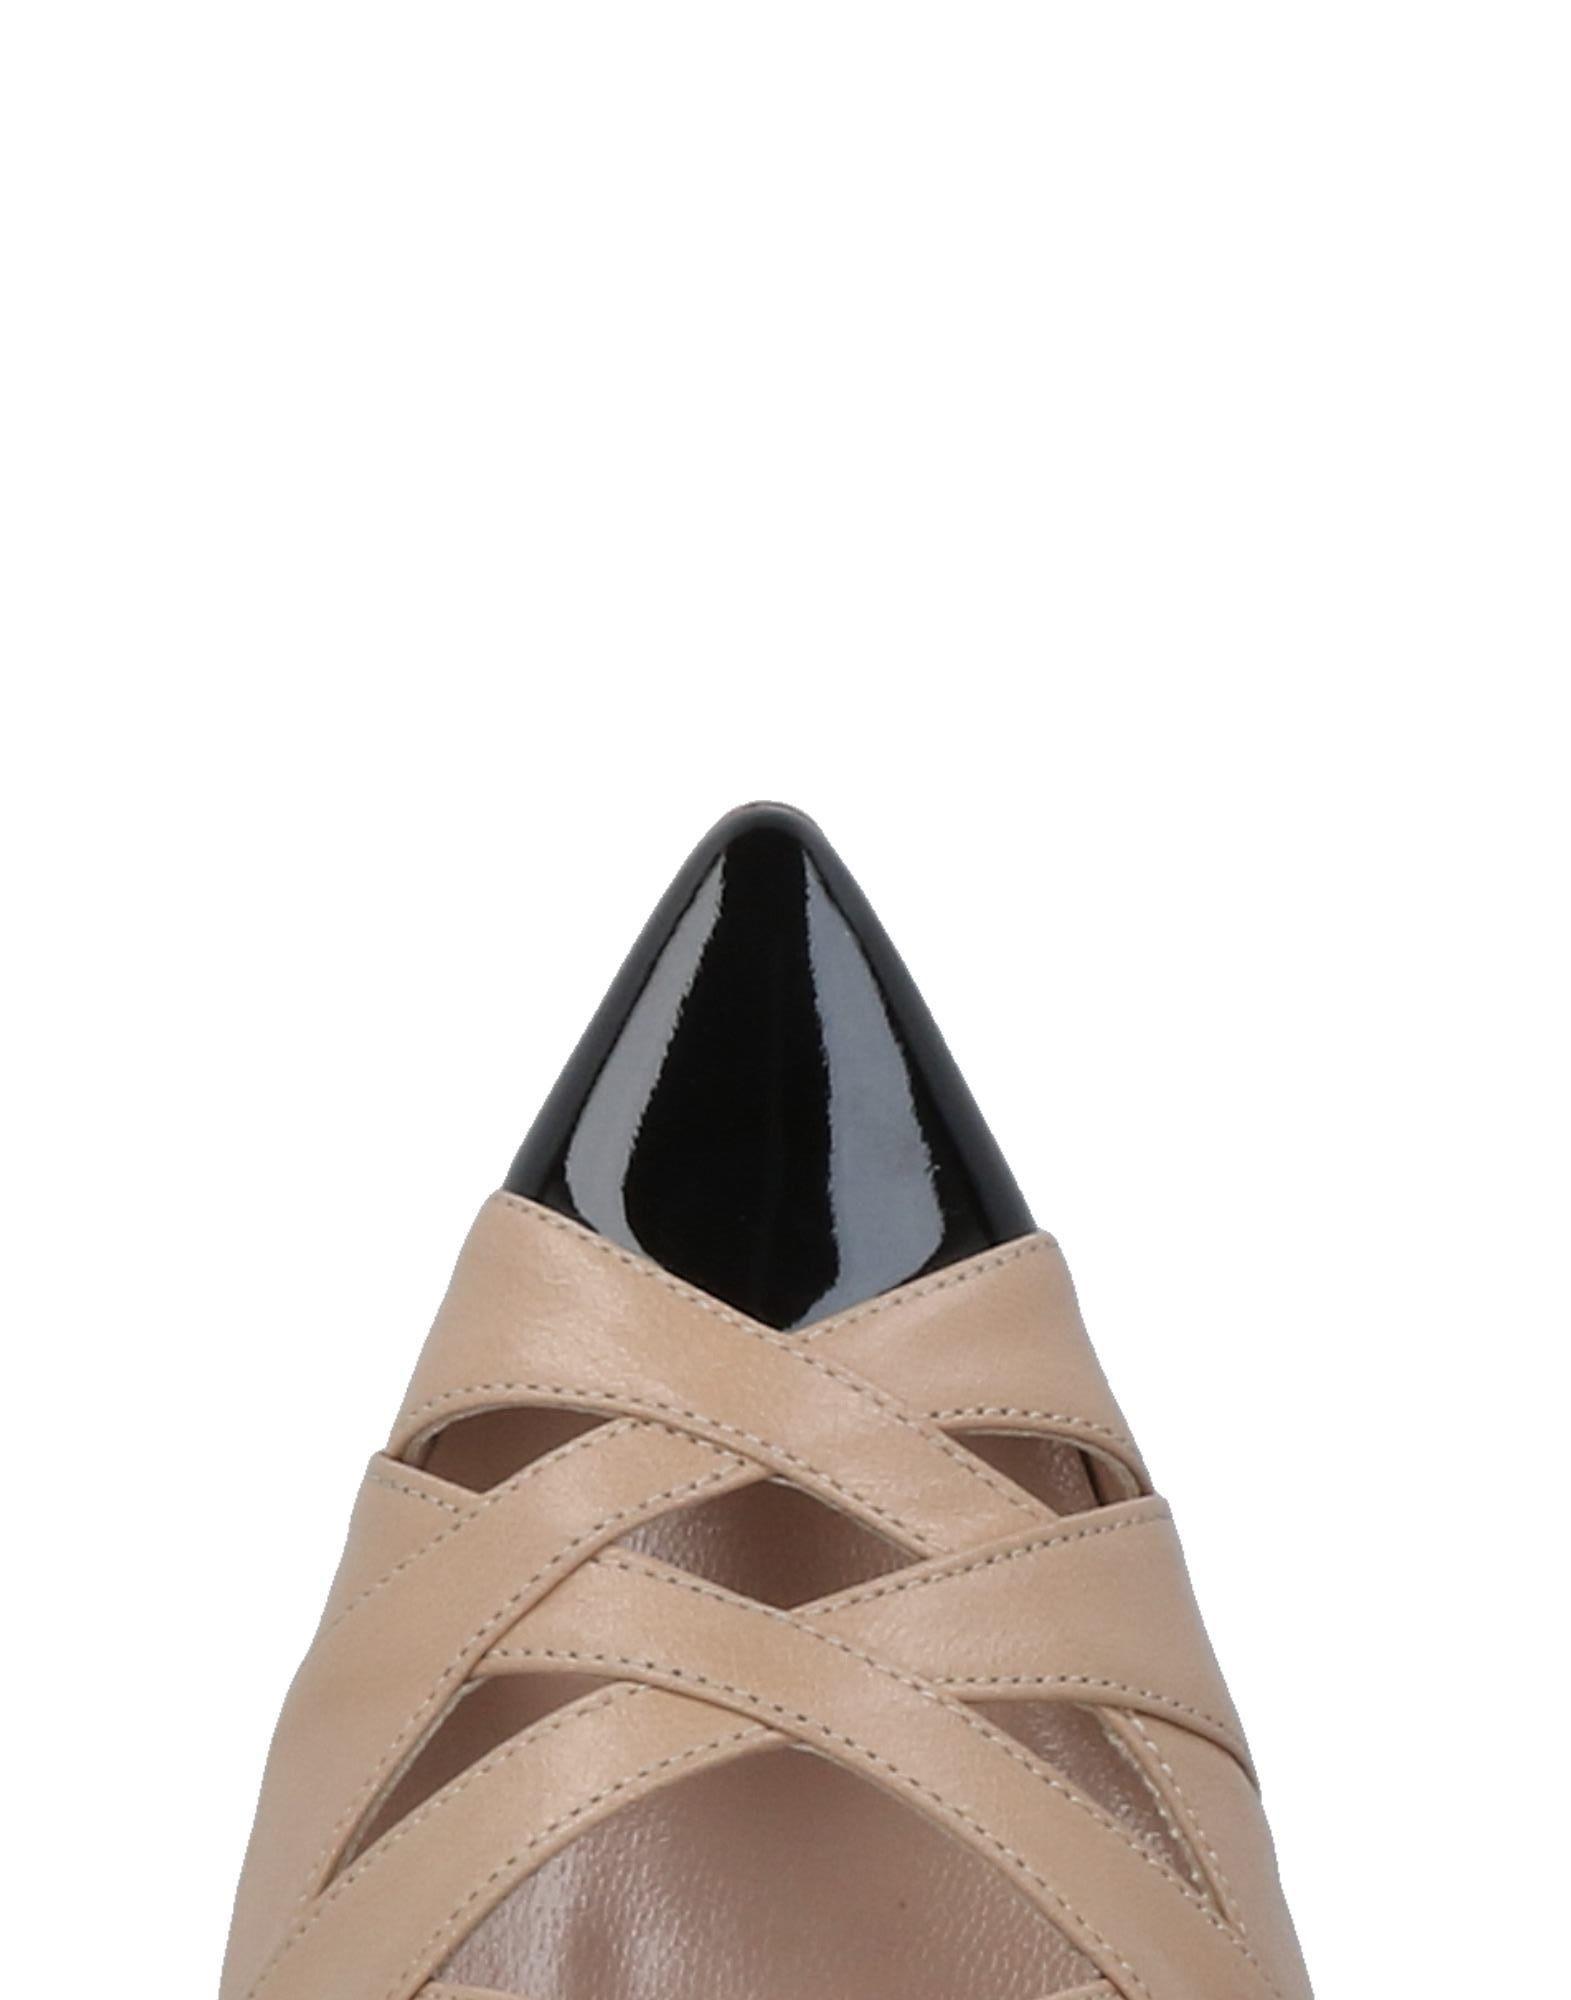 Stilvolle billige Schuhe Damen Mirea Negro Pumps Damen Schuhe  11485636US 4dbd26